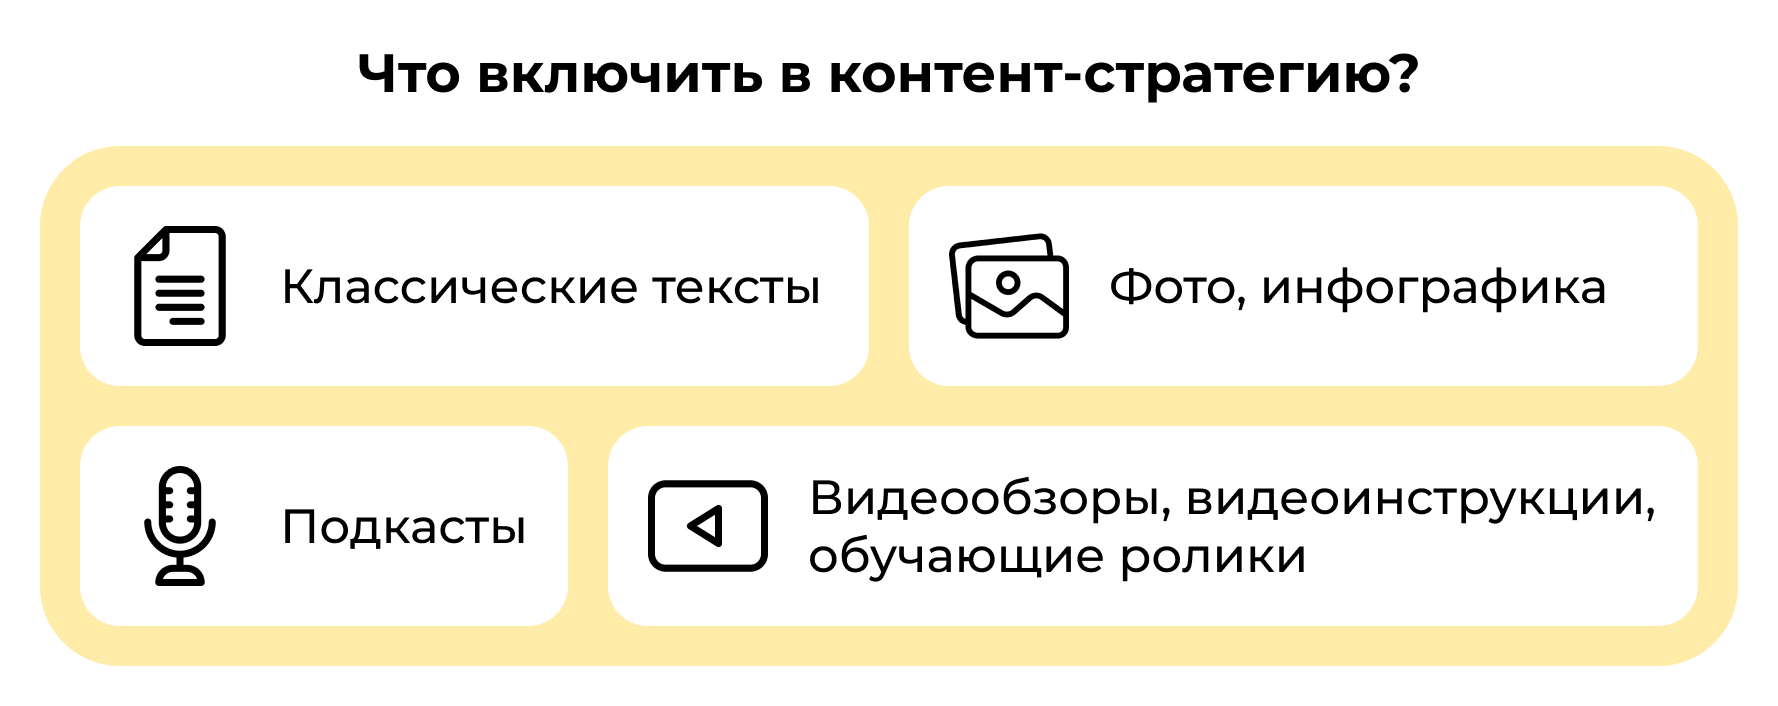 элементы контент-стратегии